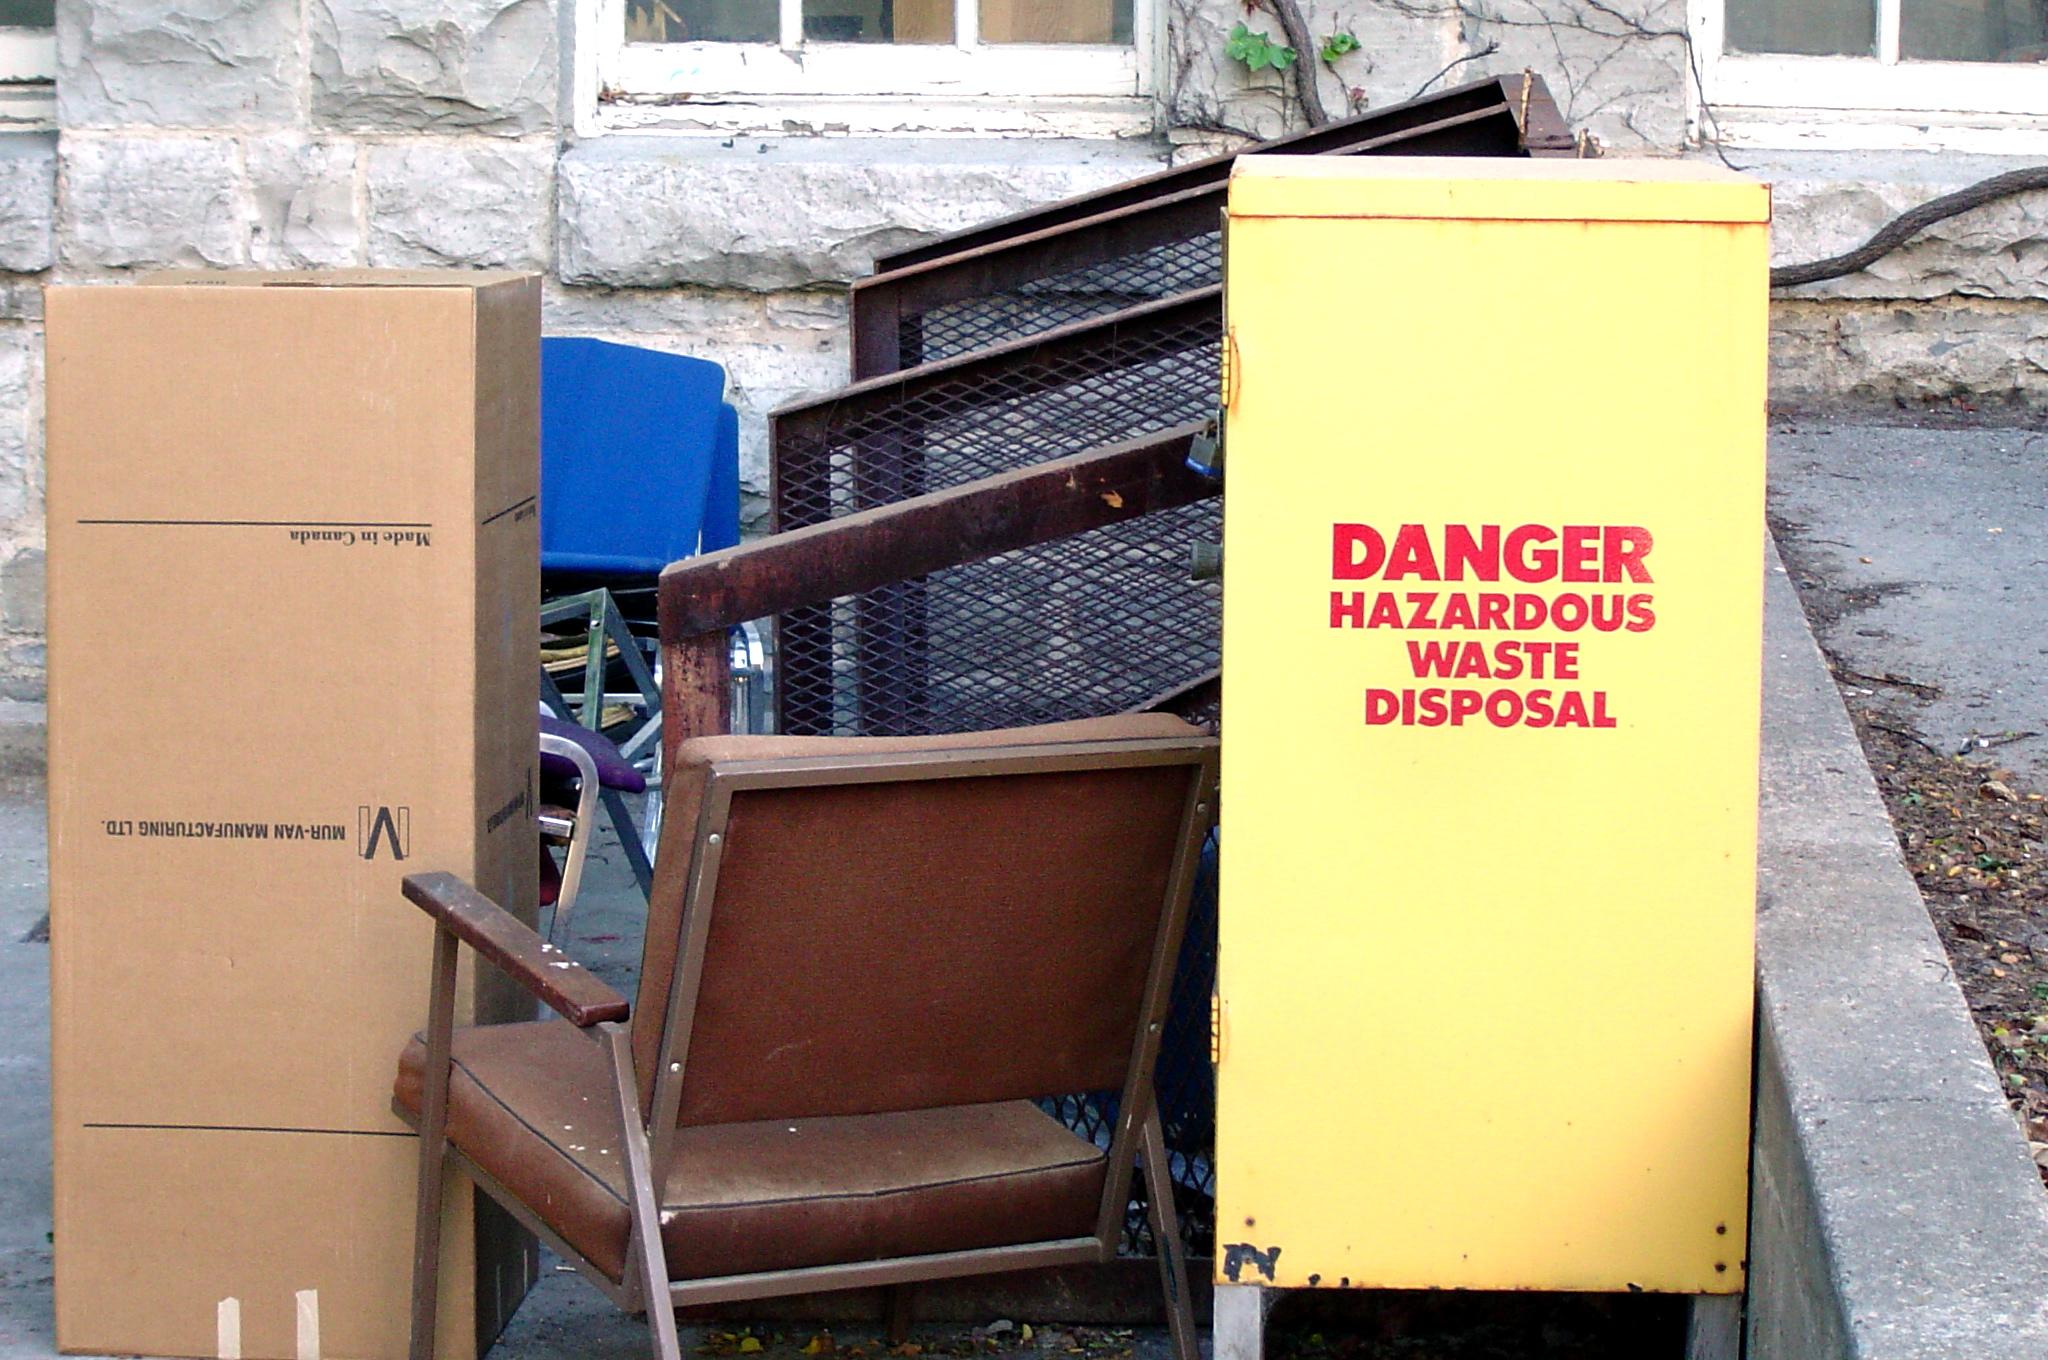 How to Handle Hazardous Waste Disposal